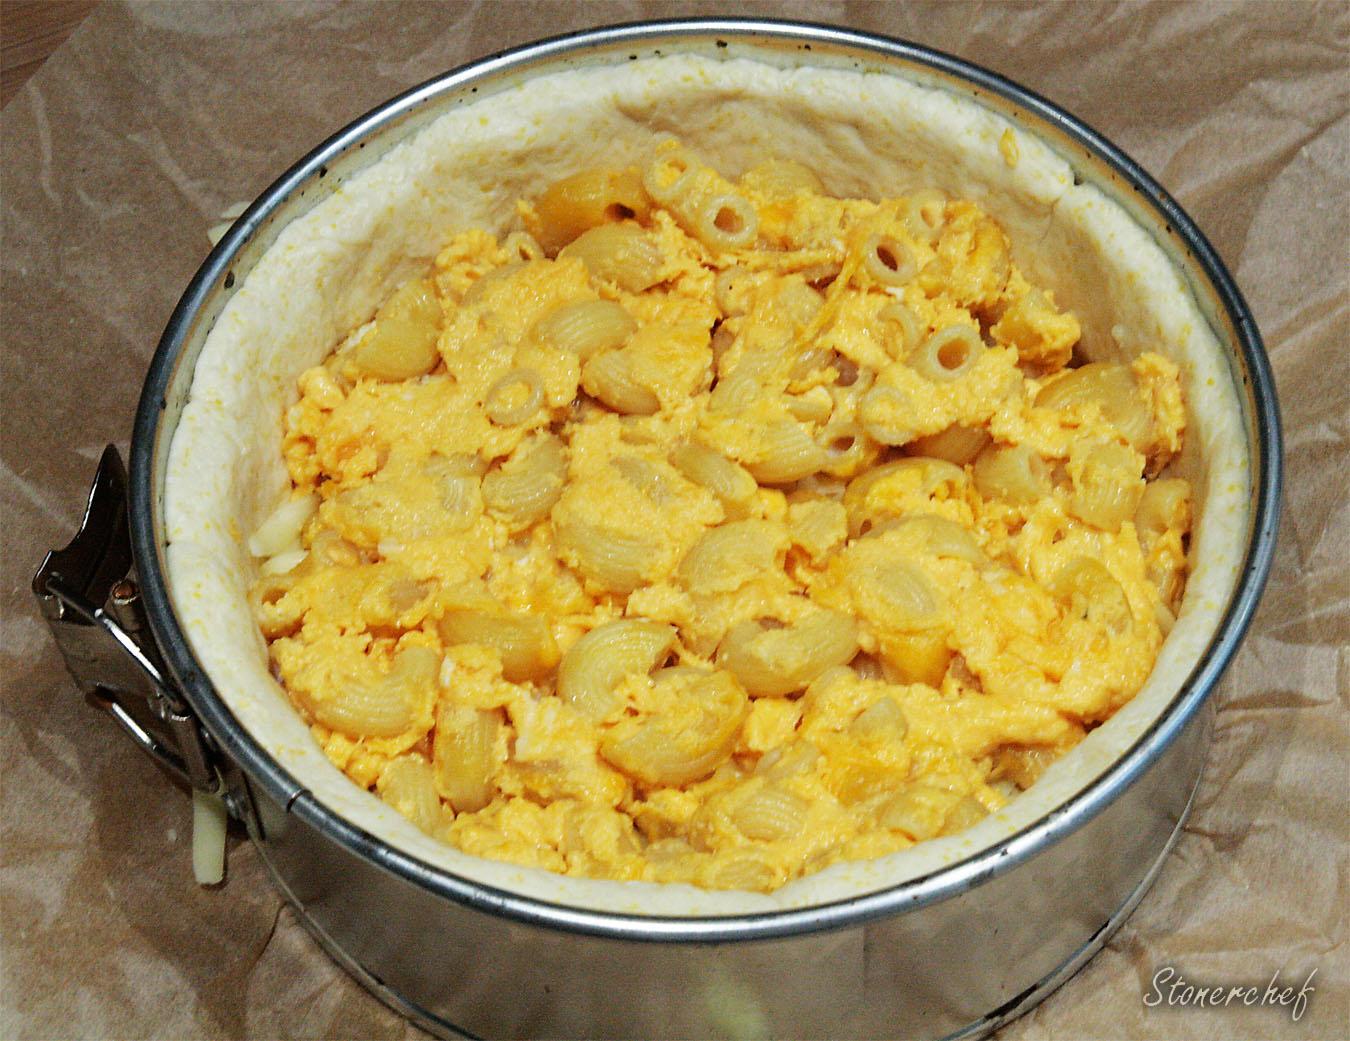 mozzarella i mac and cheese na pizzy